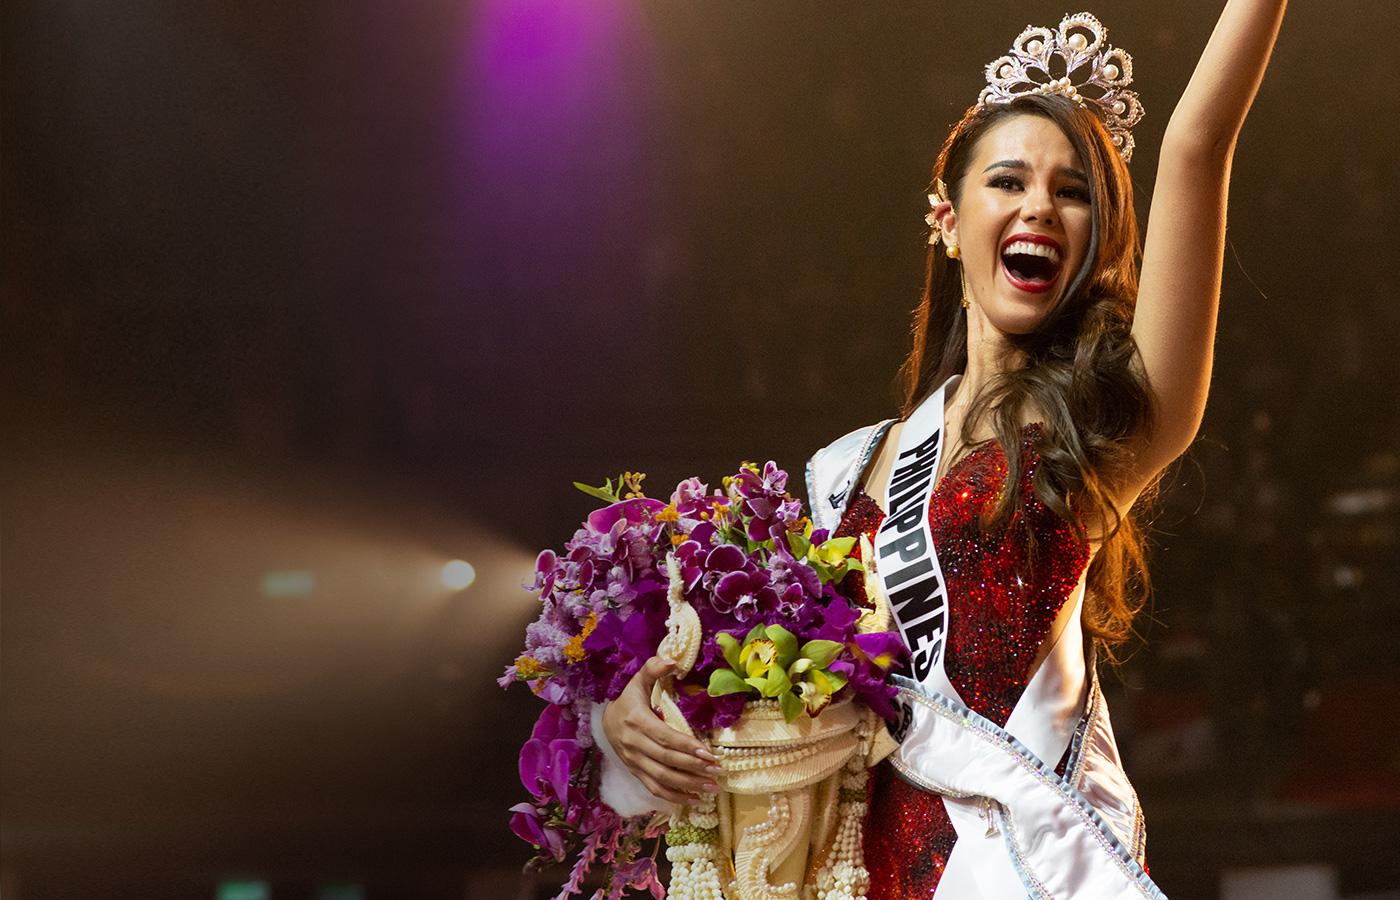 ef2c2501081c Miss Universe 2018: The Philippines' Catriona Gray